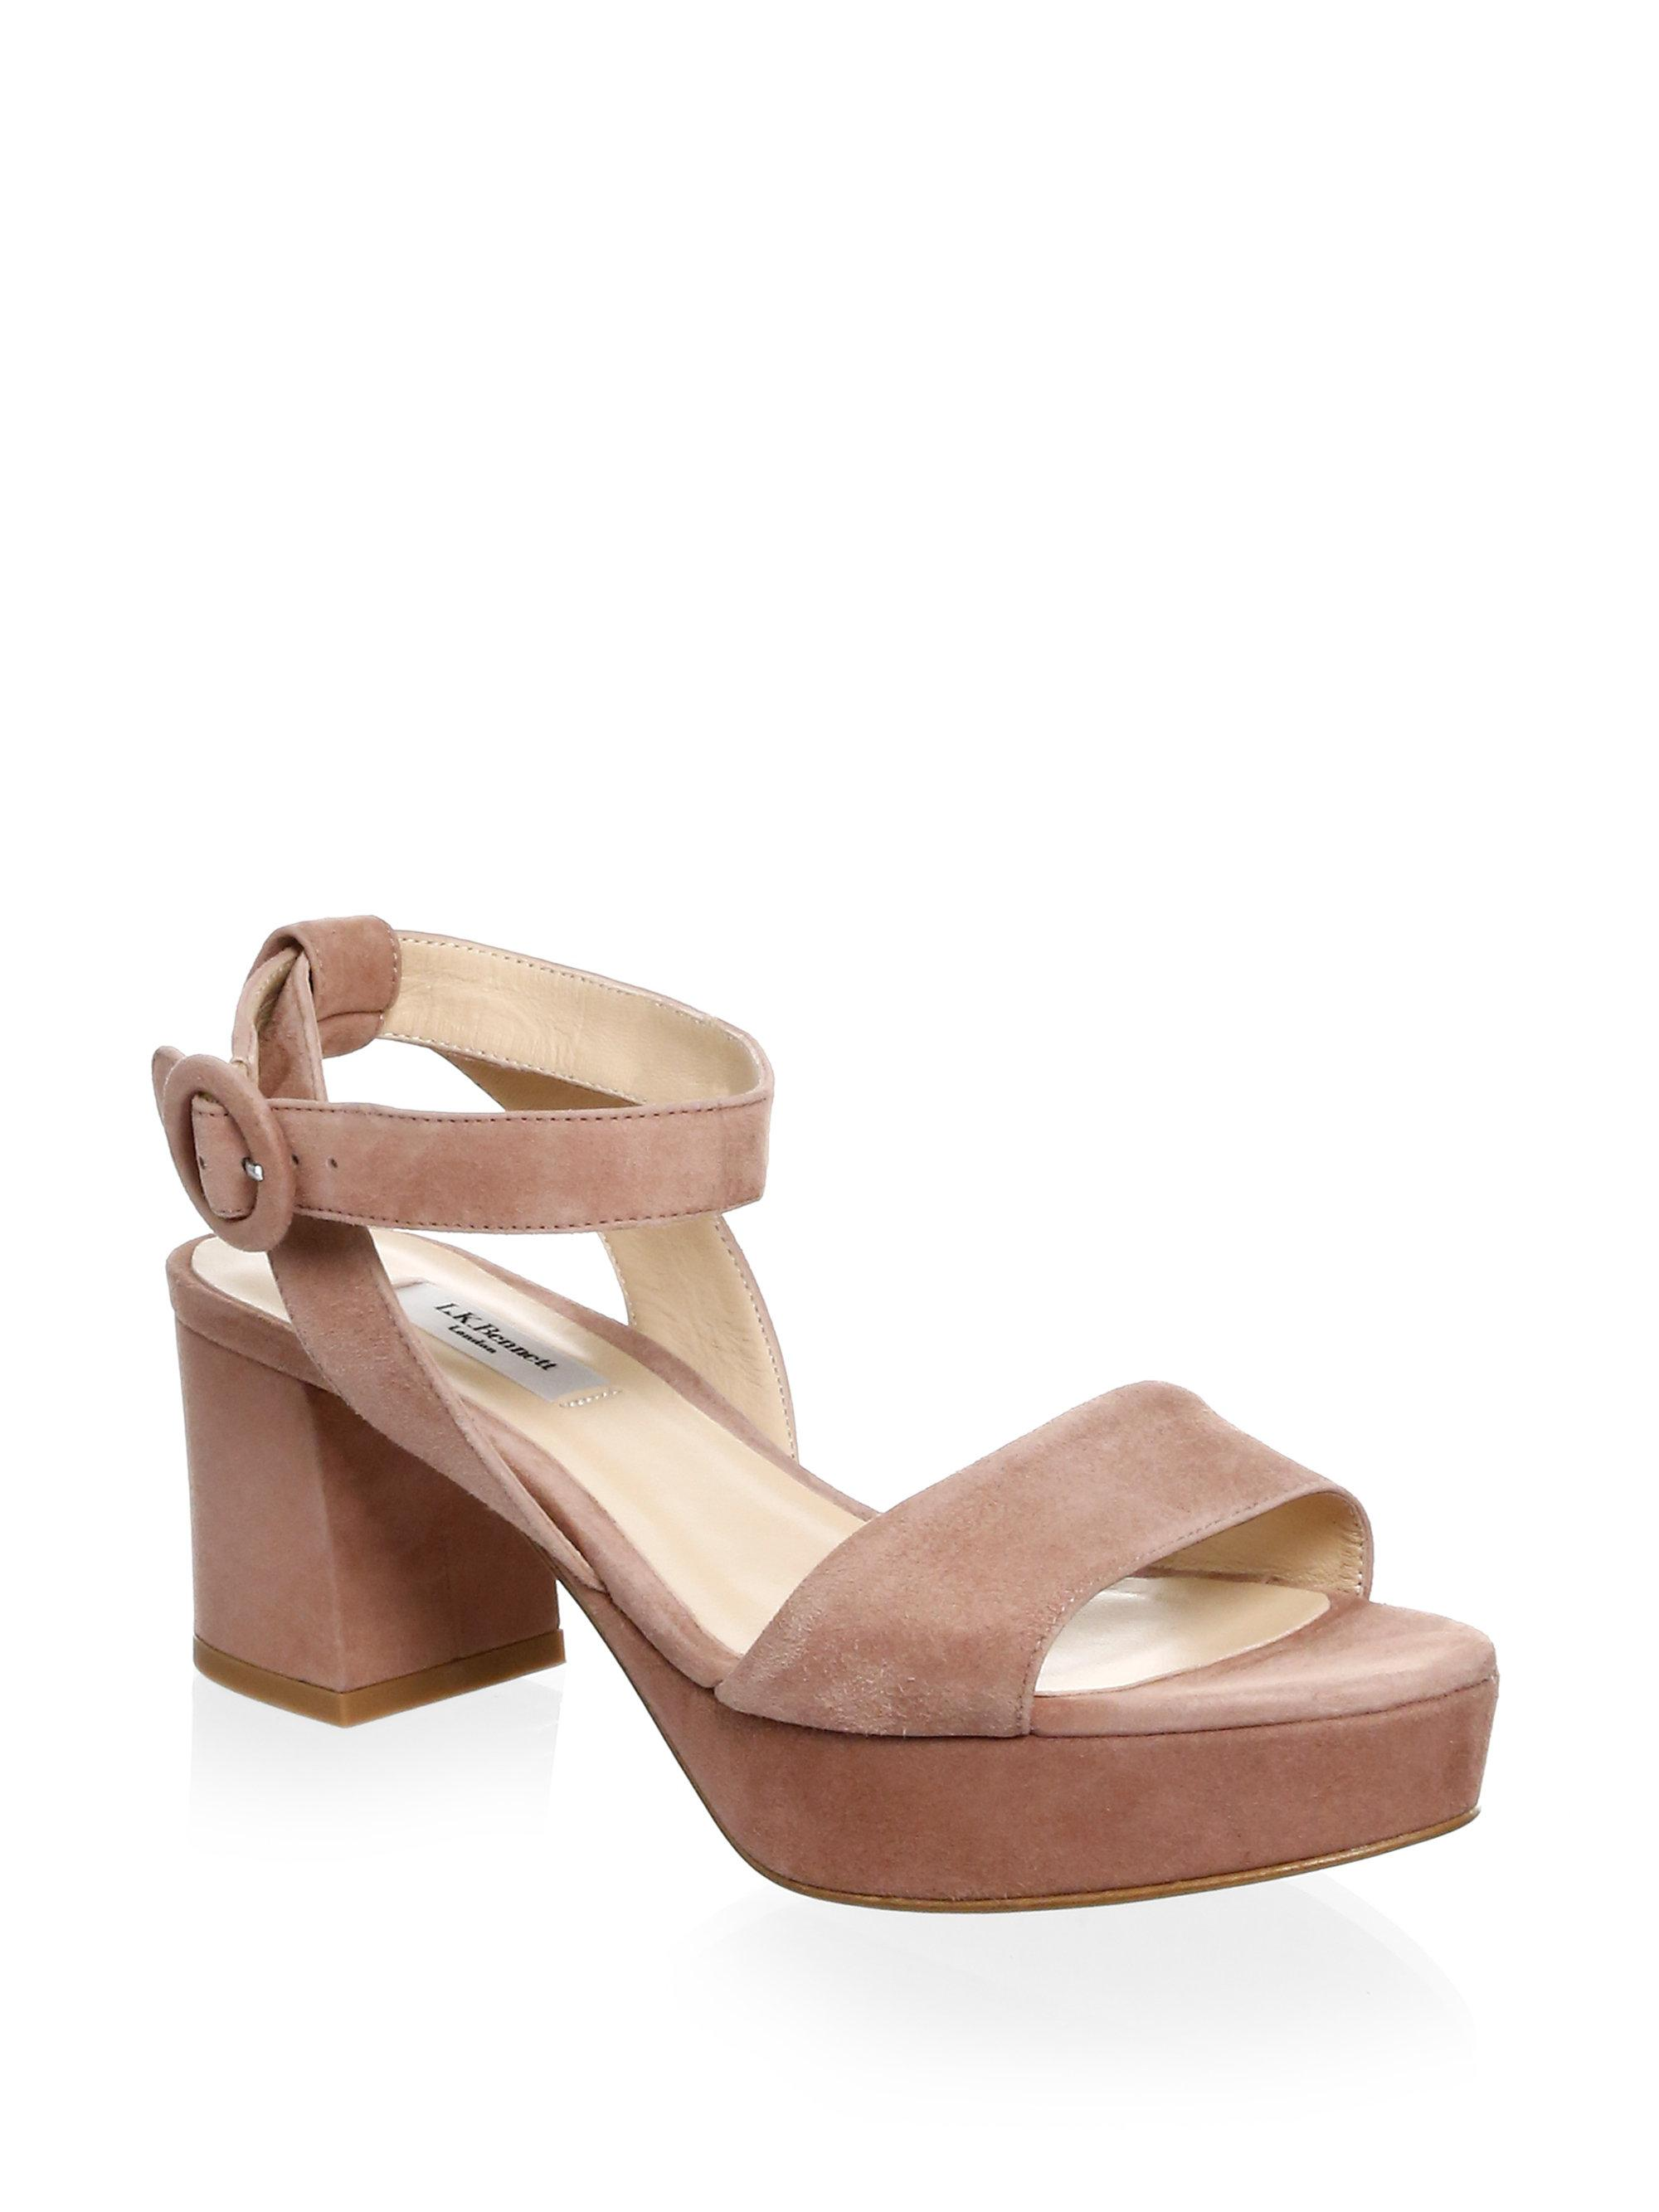 L.K. Bennett Block Heel Leather Platform Sandals uwArzS